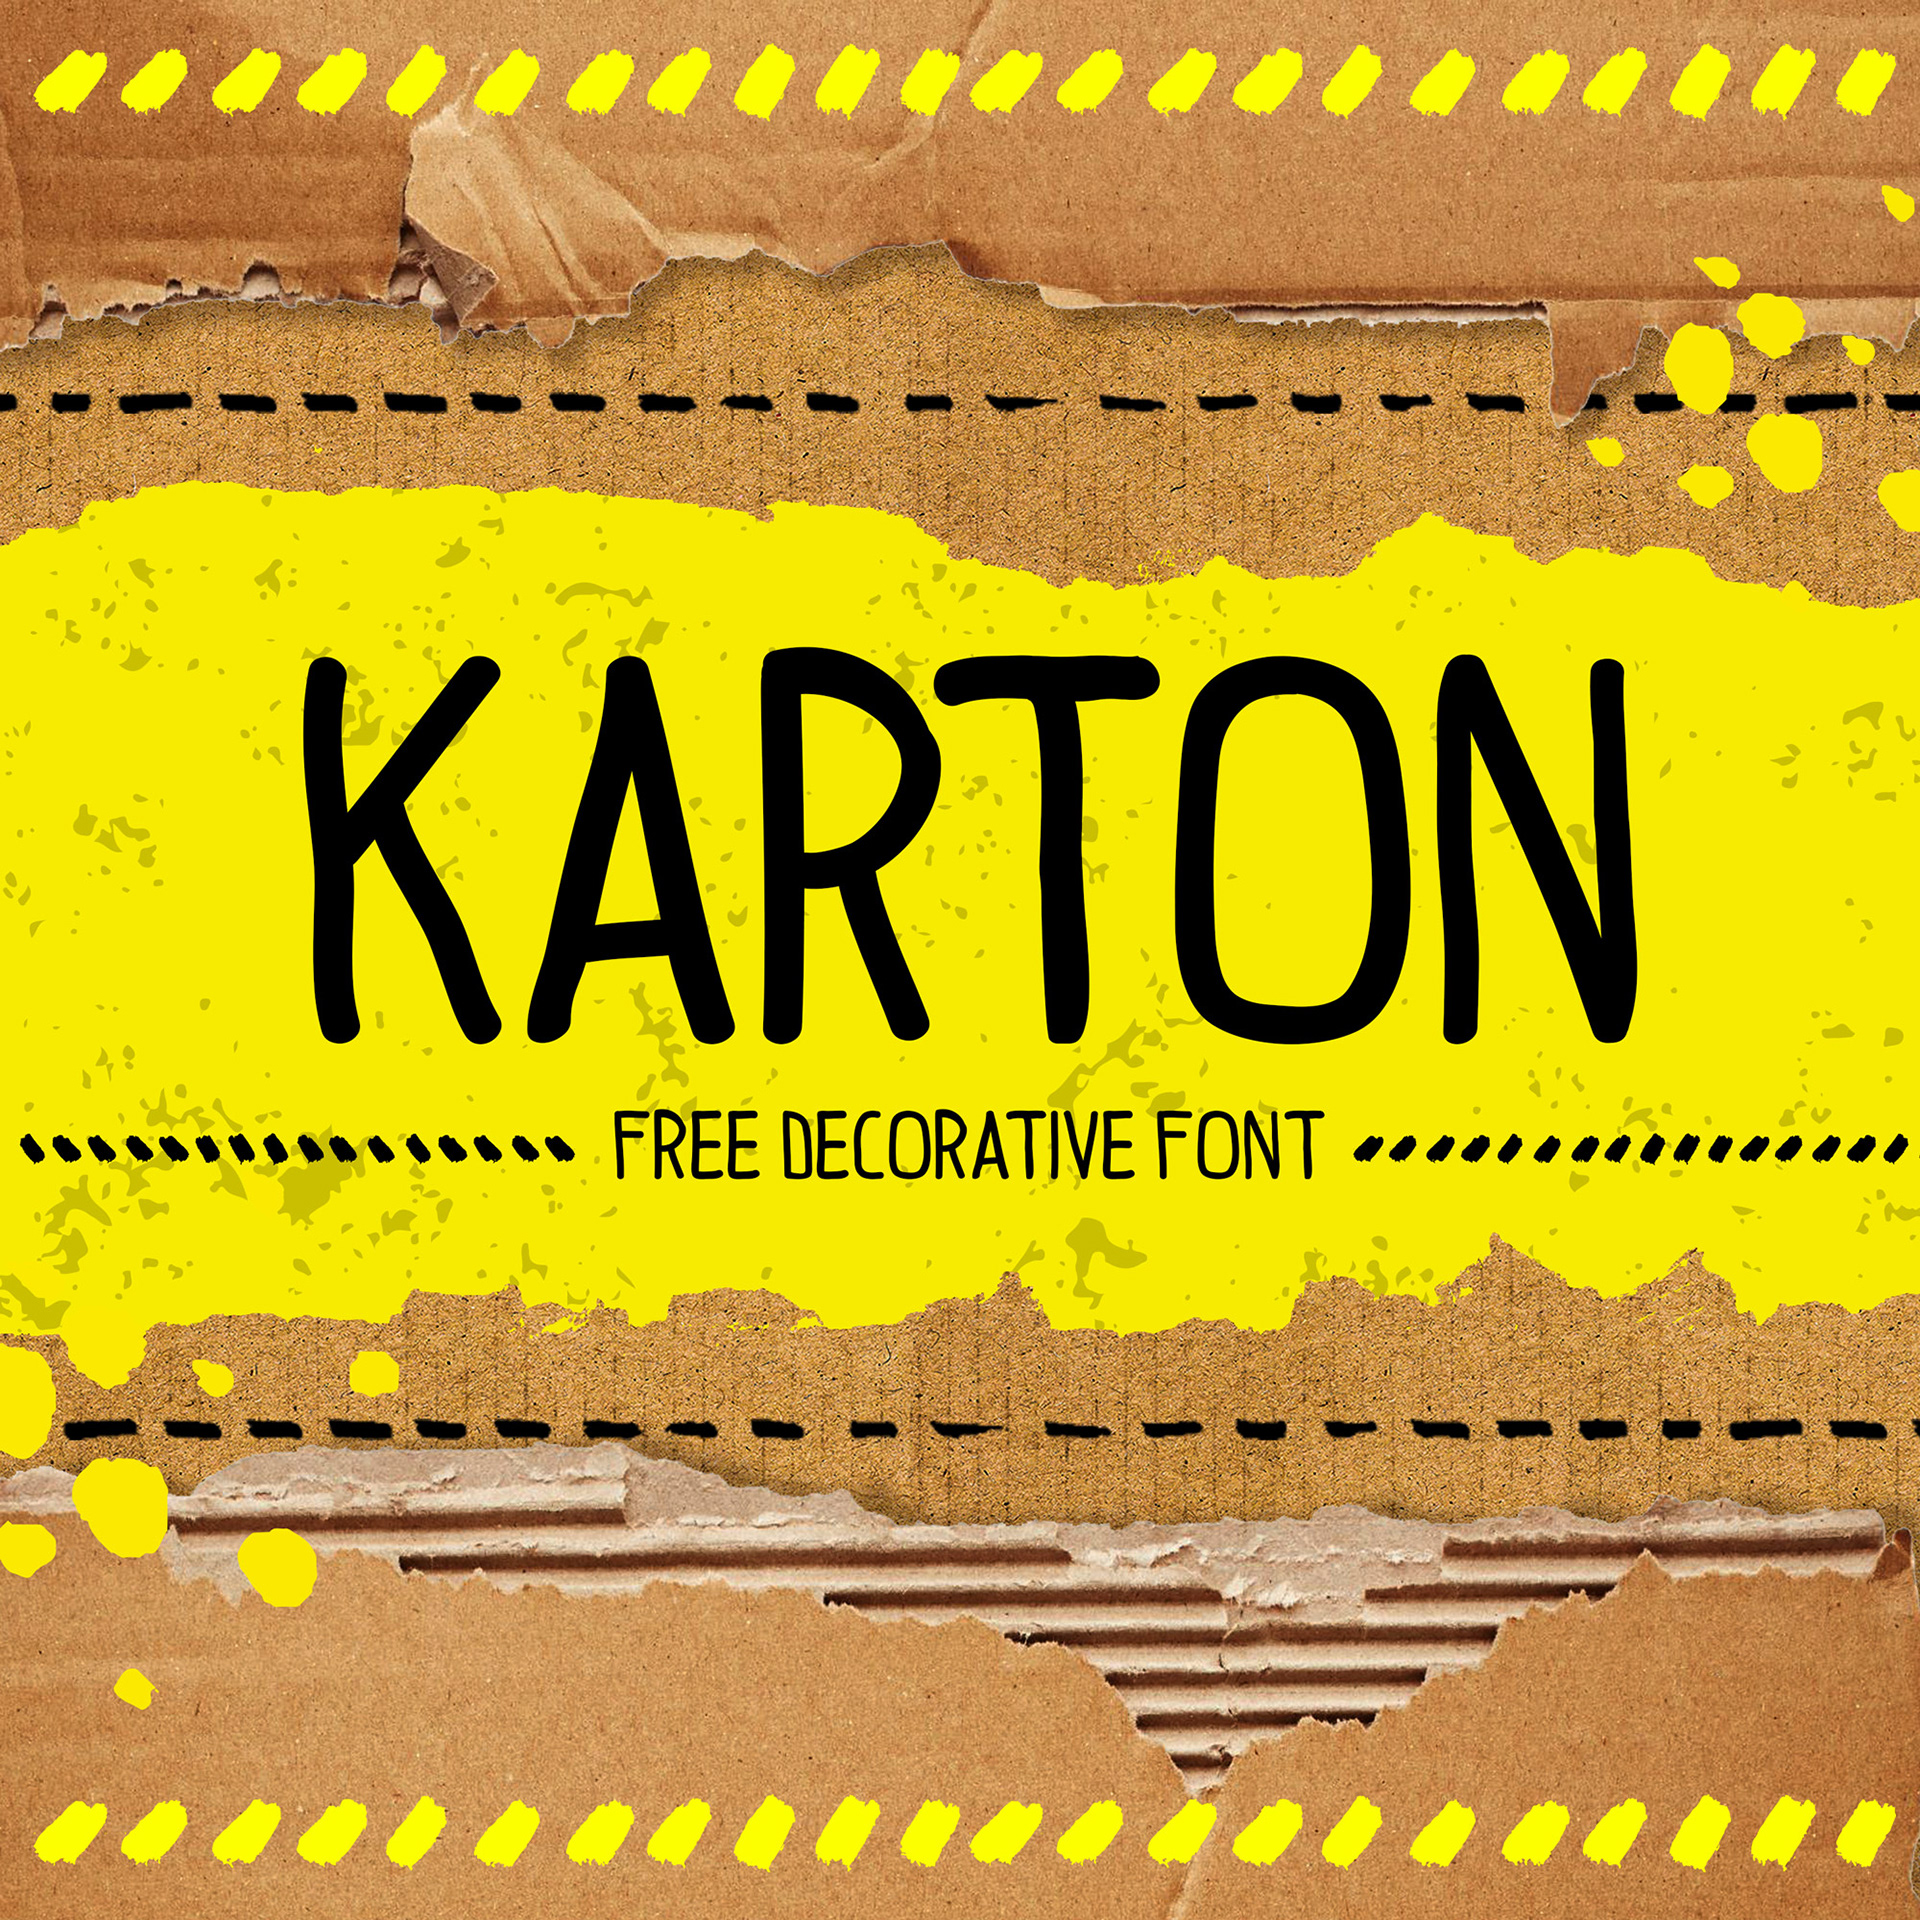 Karton Free Font - script, sans-serif, decorative-display